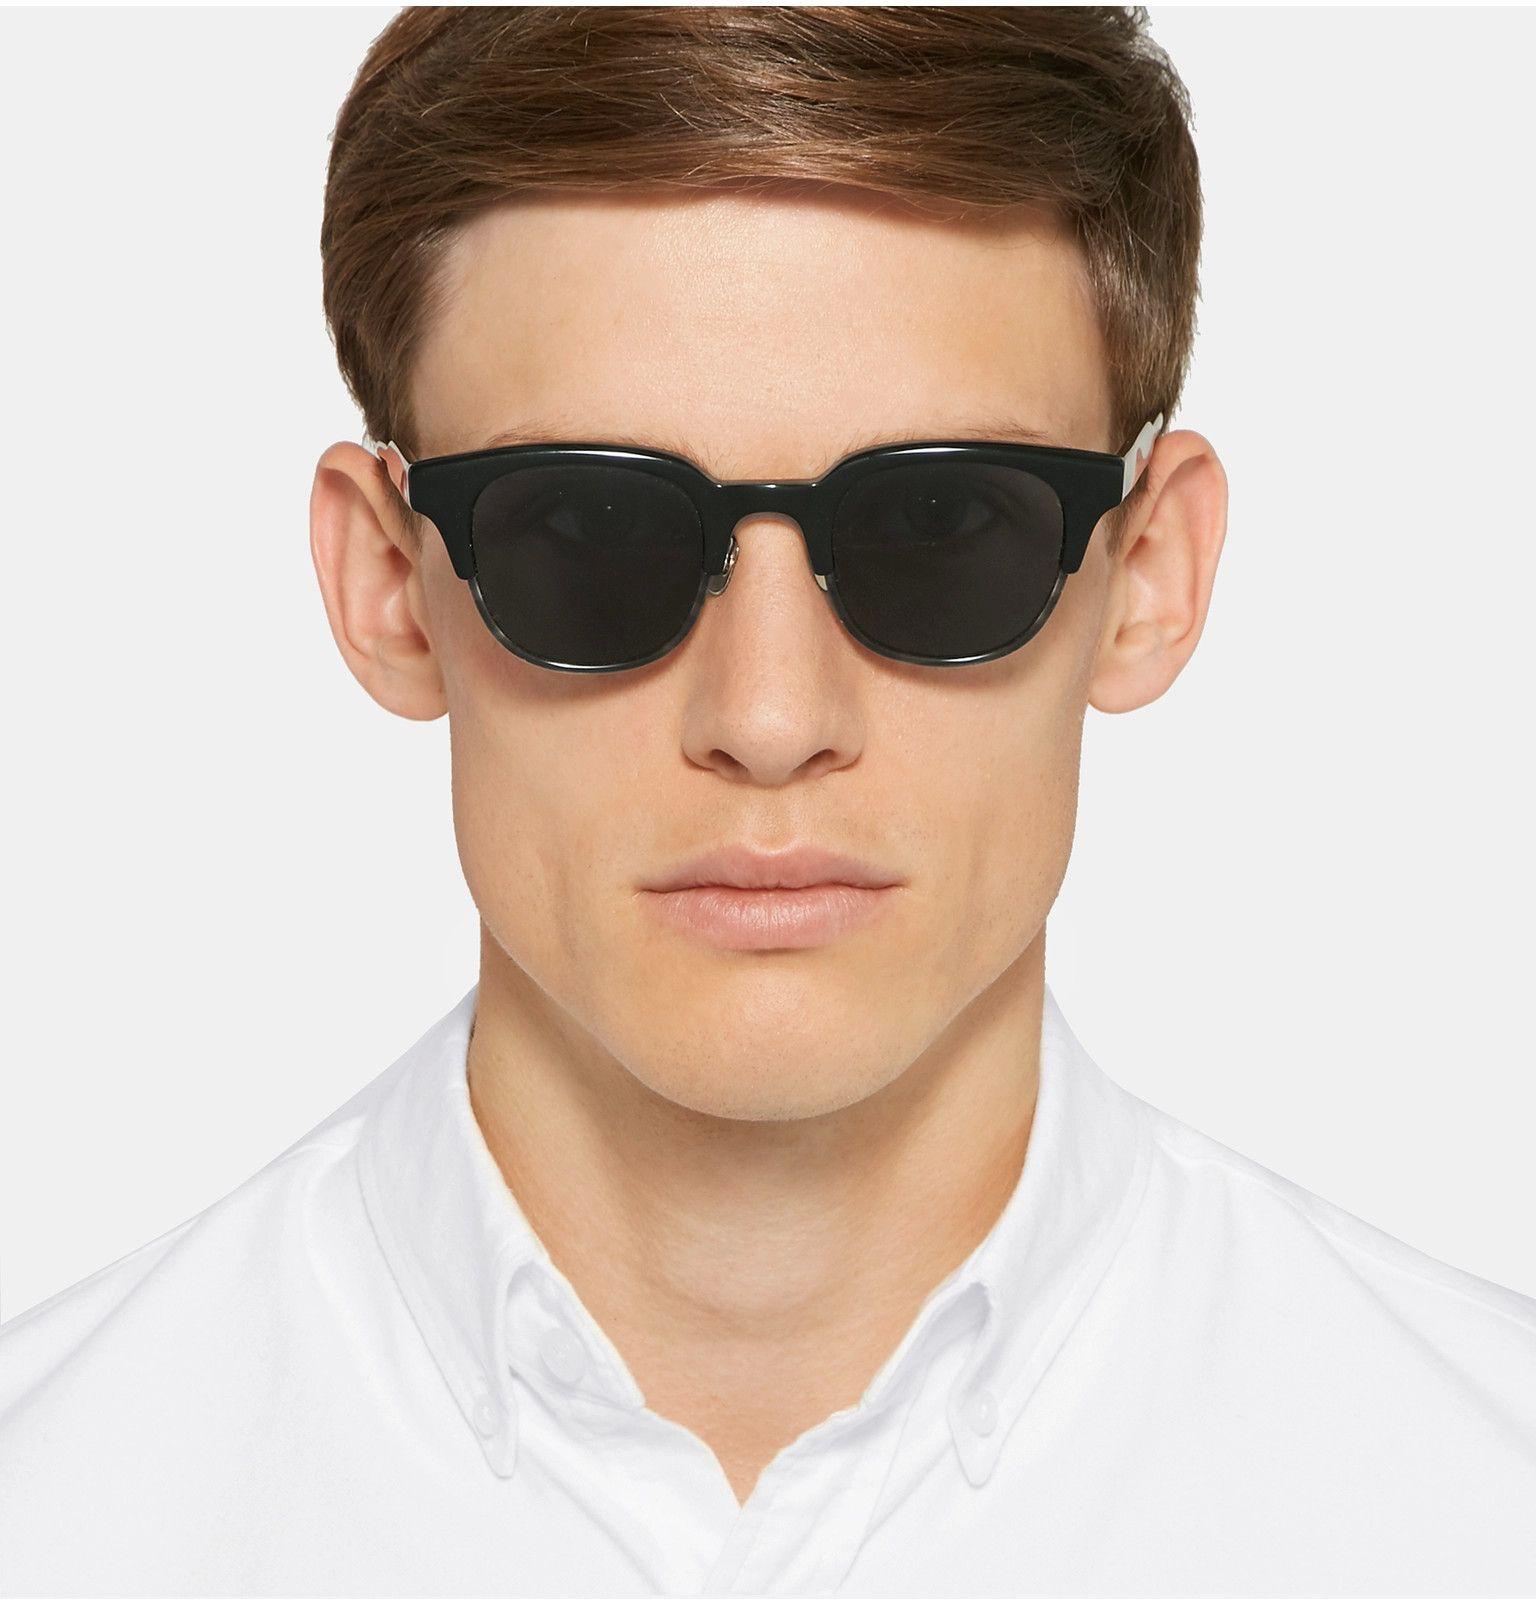 91a883bf25f EYEVAN 7285 D-Frame Acetate Sunglasses